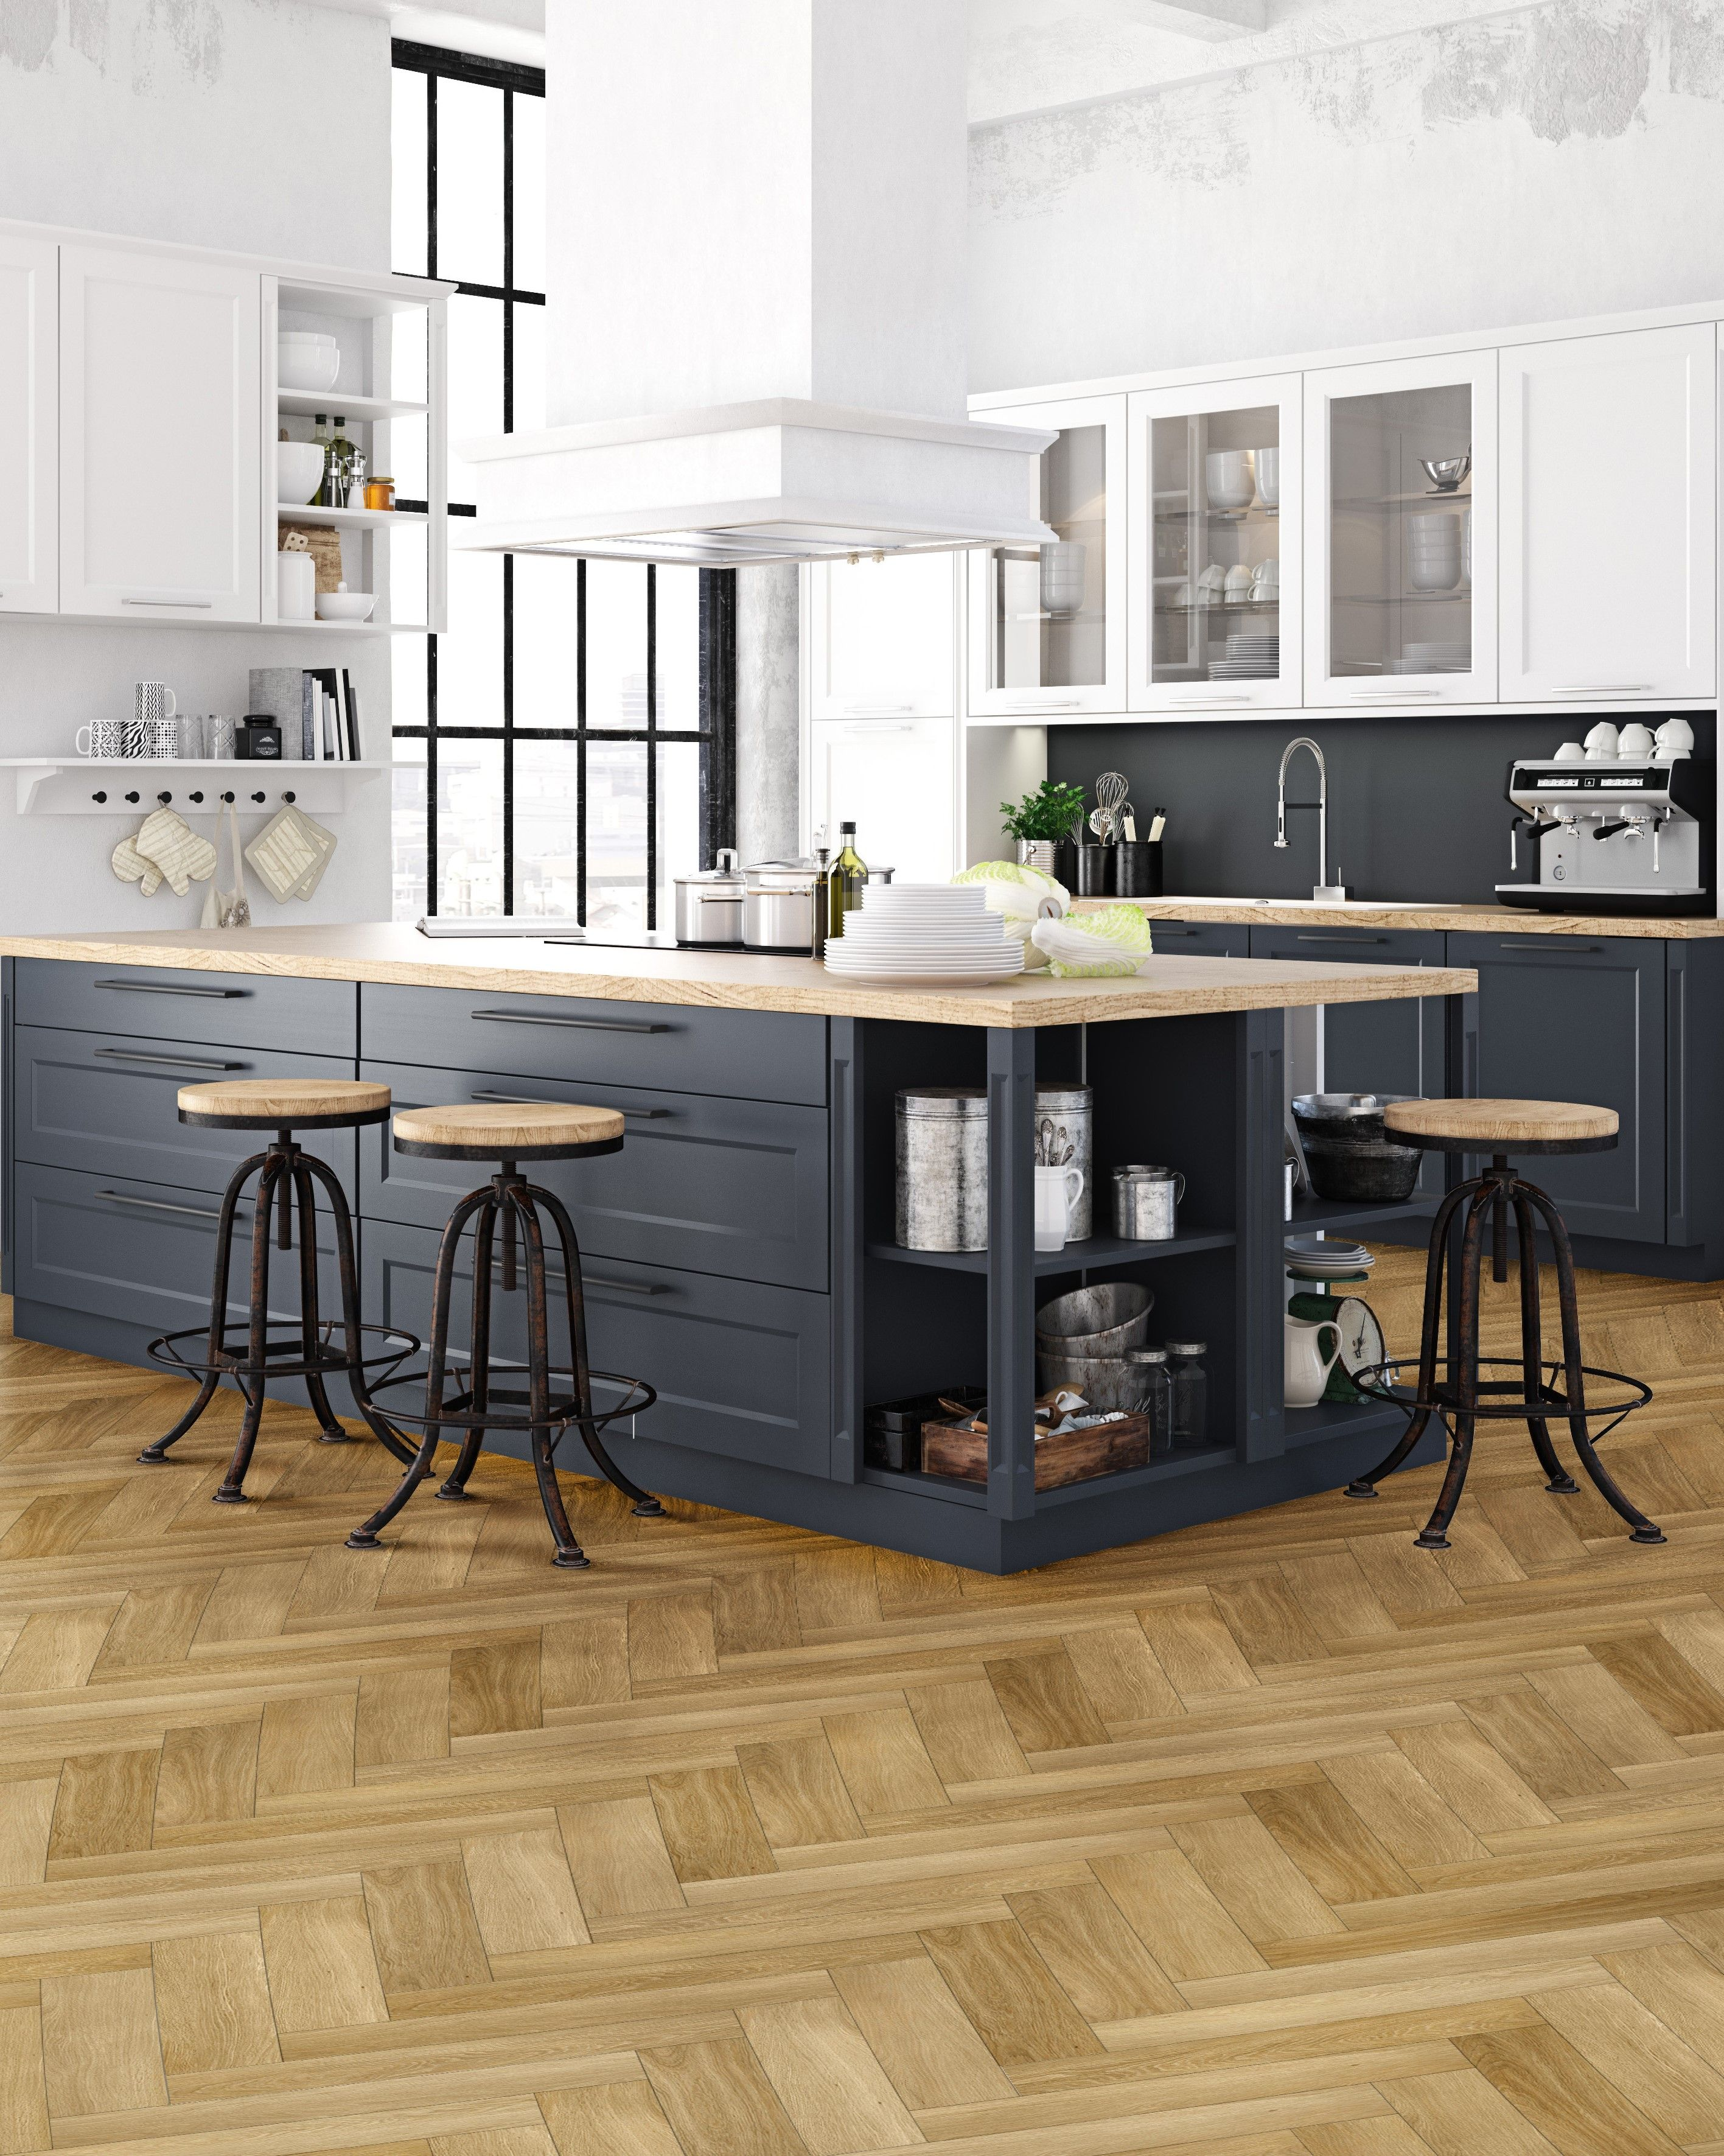 Vinyl Herringbone Flooring Ideas Open Kitchen in 2020